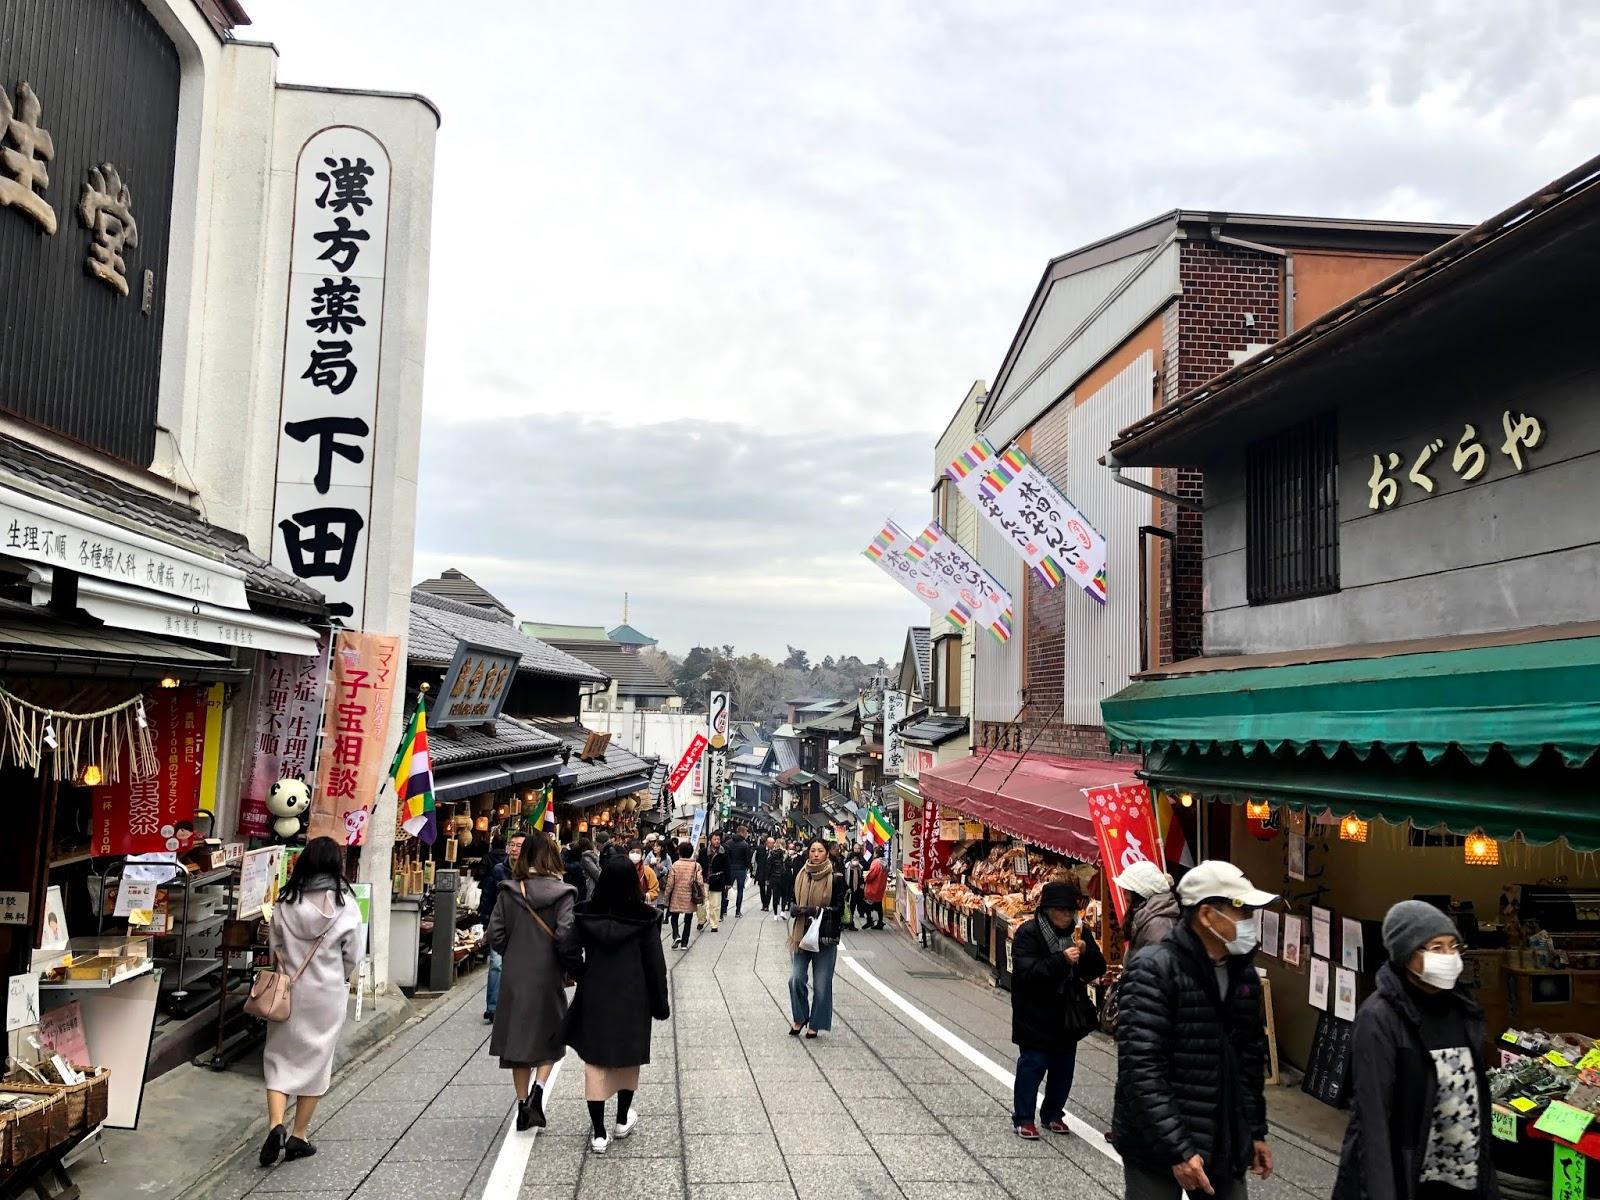 Naritasan's Omotesando